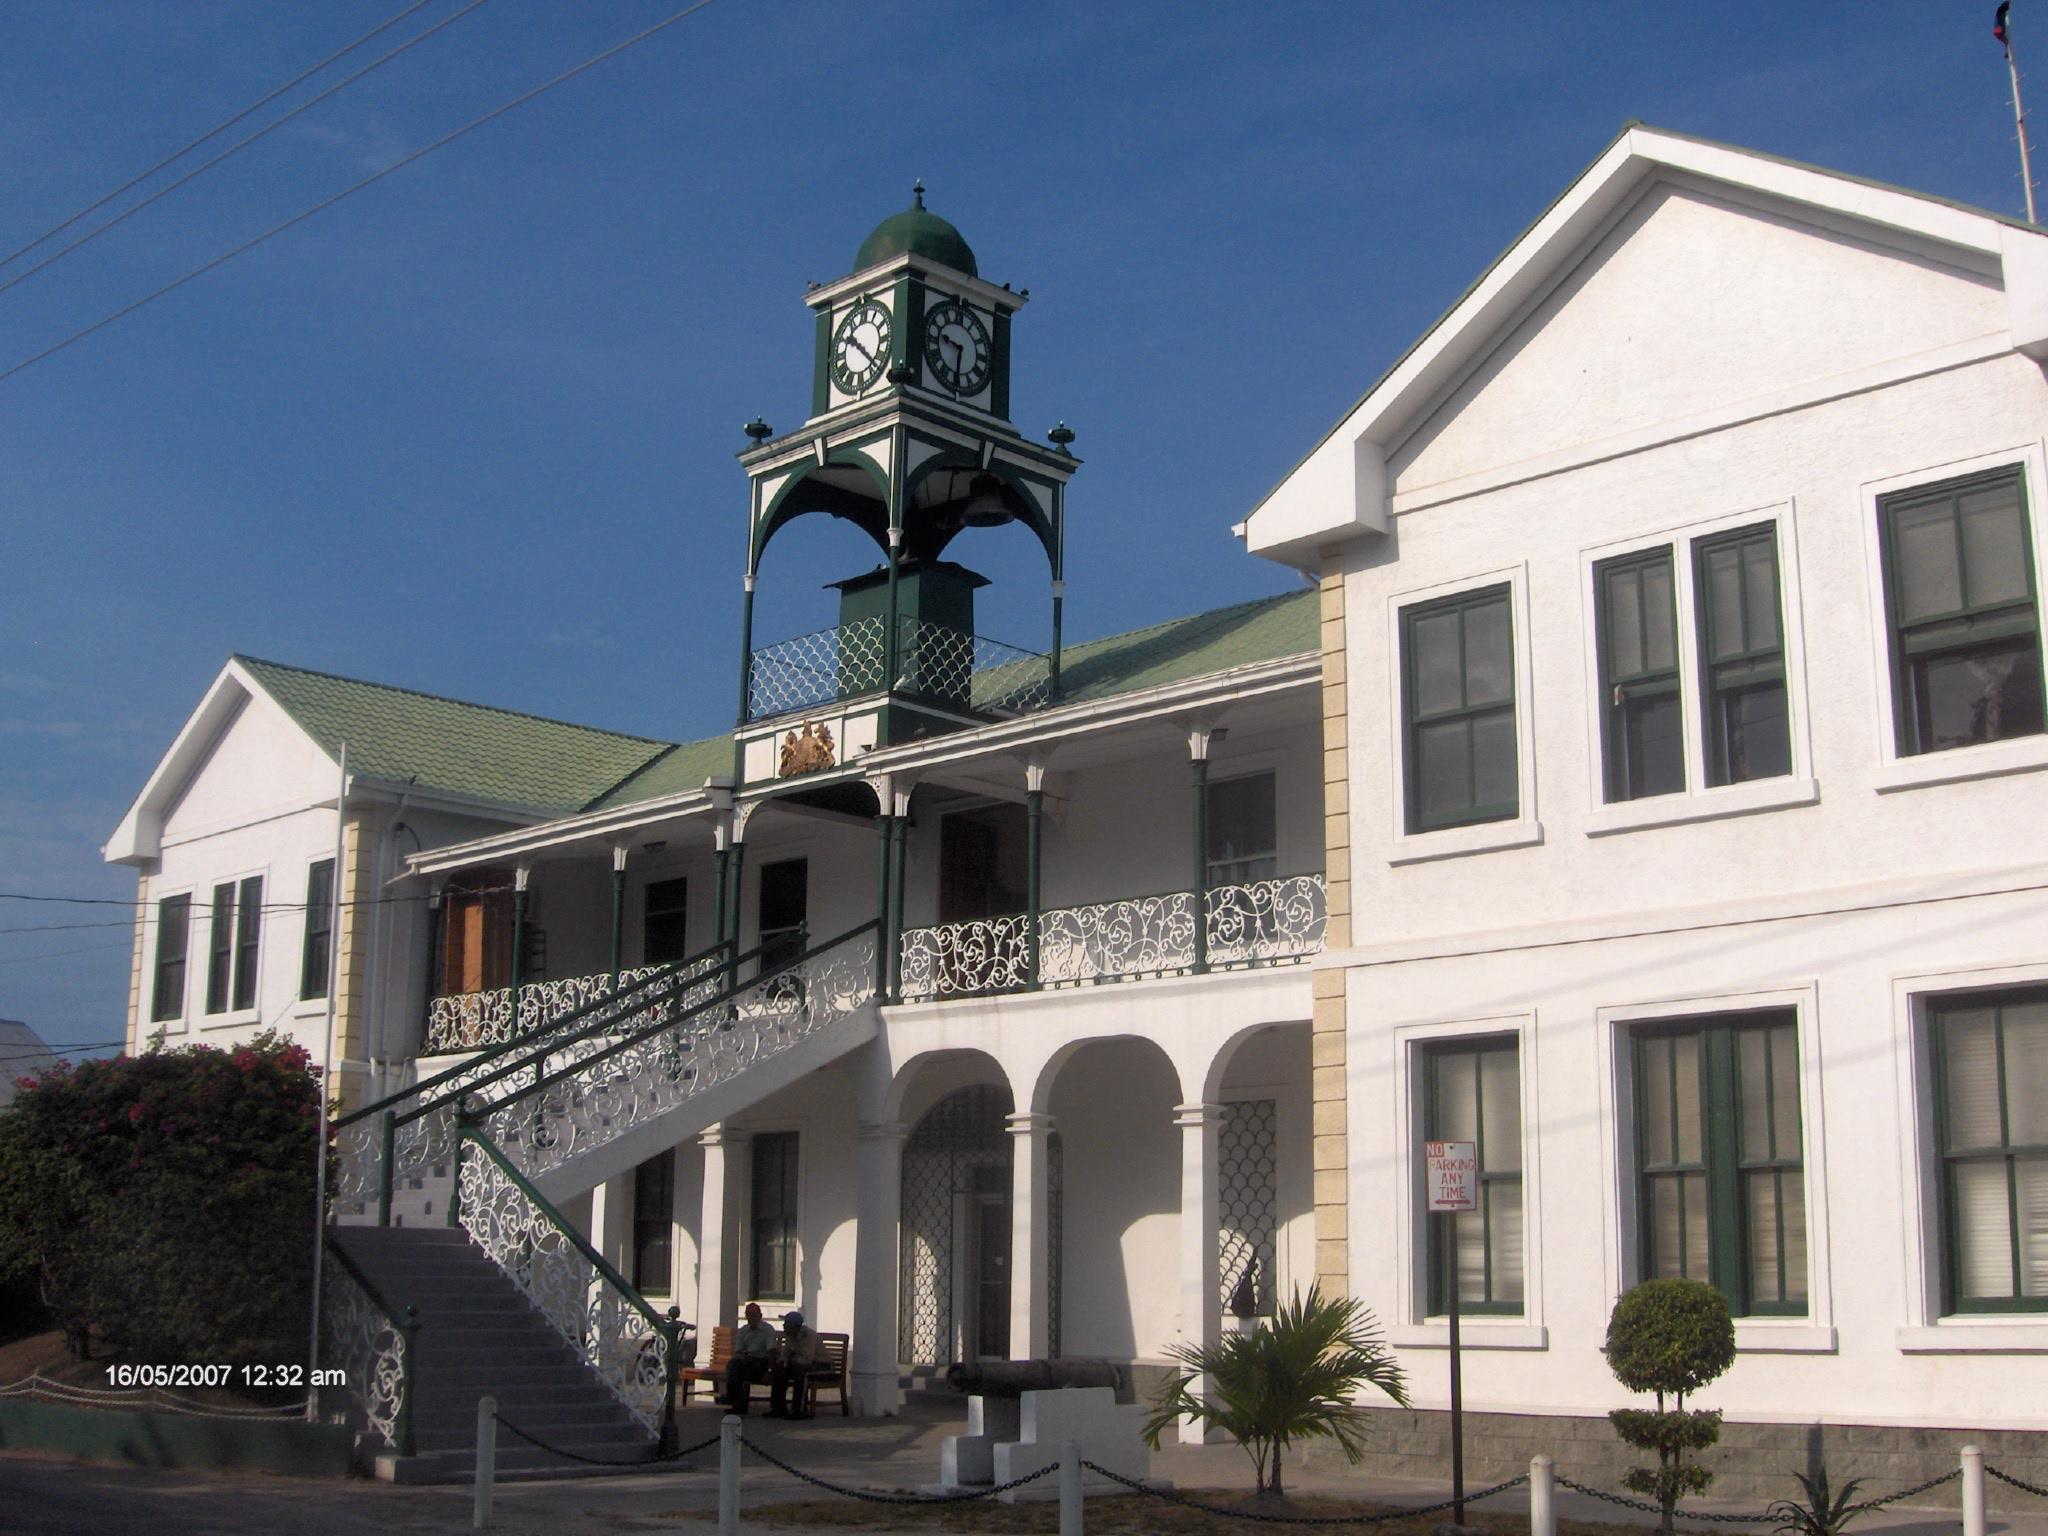 Filebase 2 - Belize Judiciary